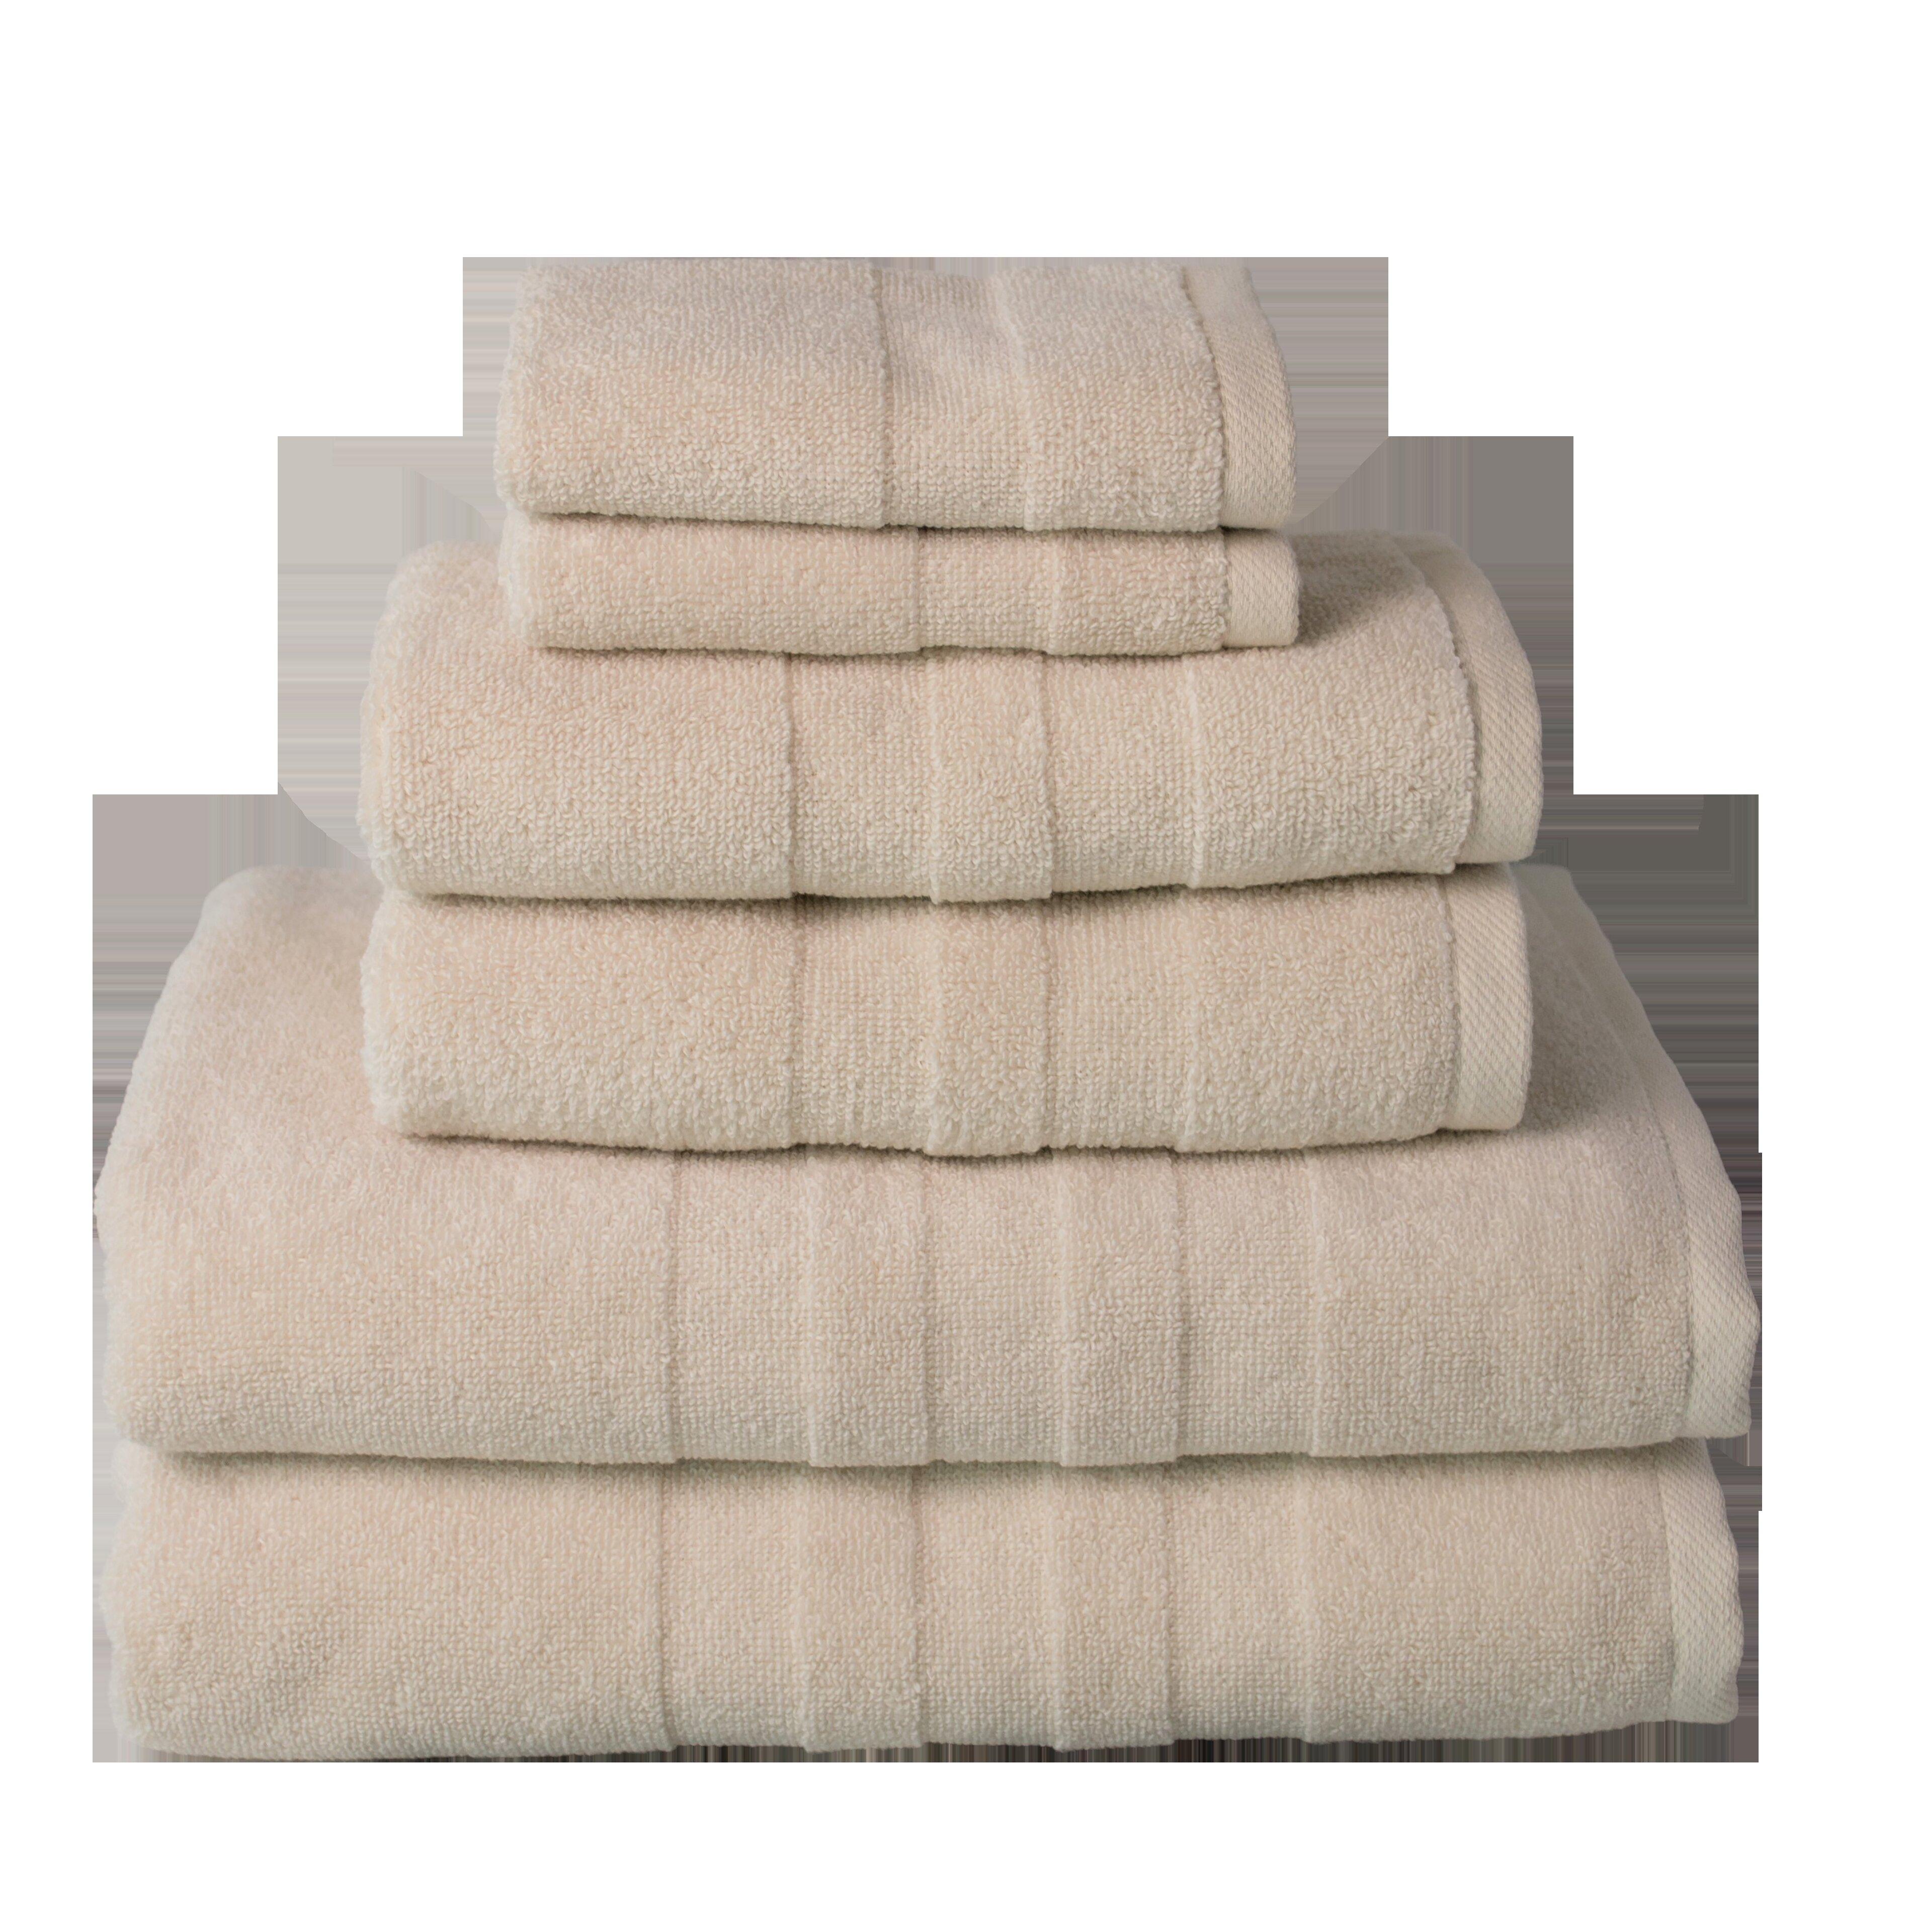 Breakwater Bay Glasco Turkish Cotton Bath Towel Reviews Wayfair